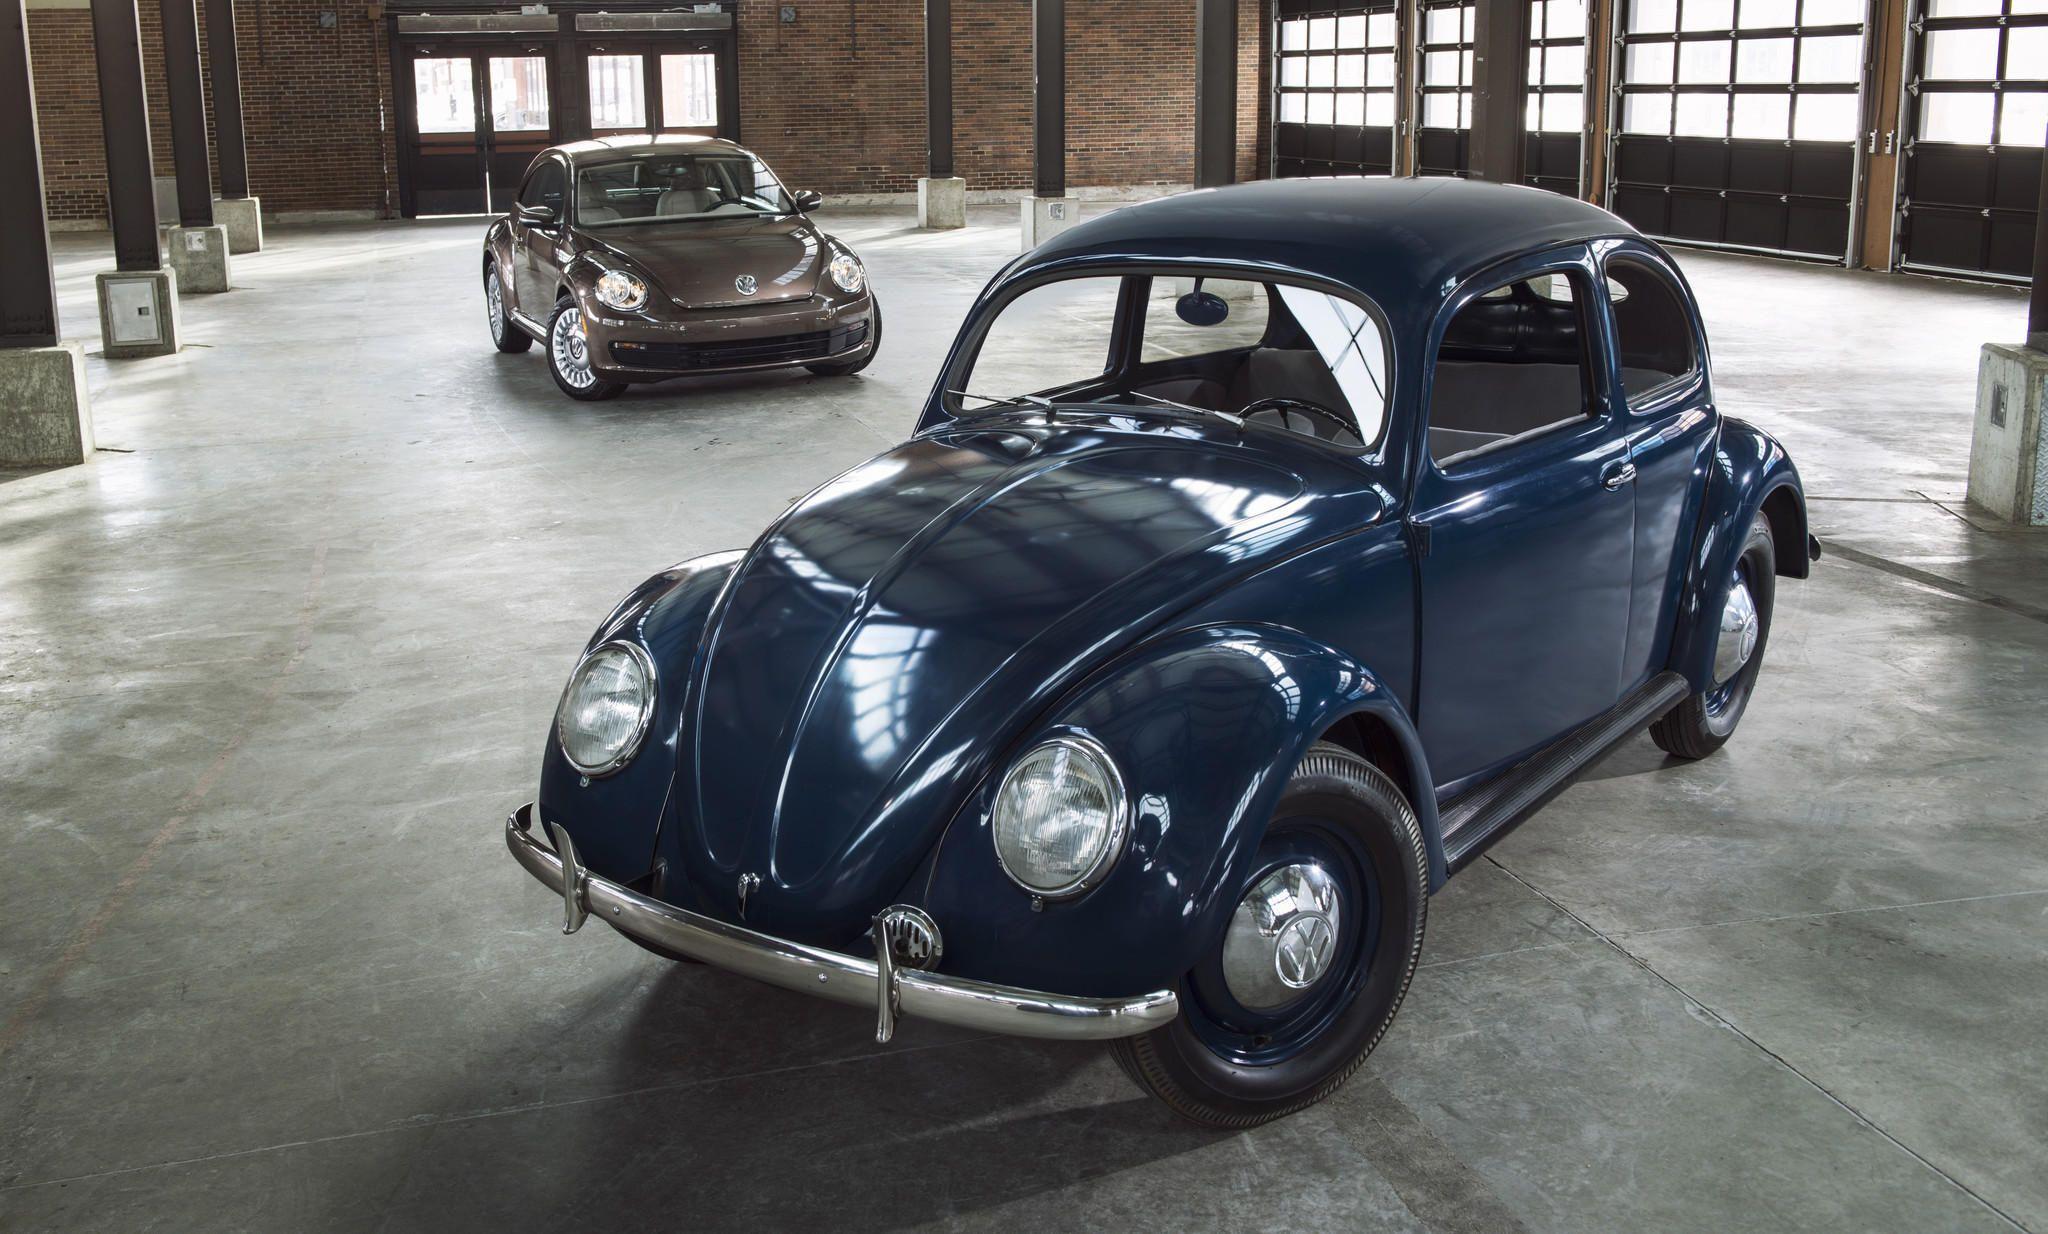 First Volkswagen Beetle arrived in a U.S. showroom 65 years ago ...